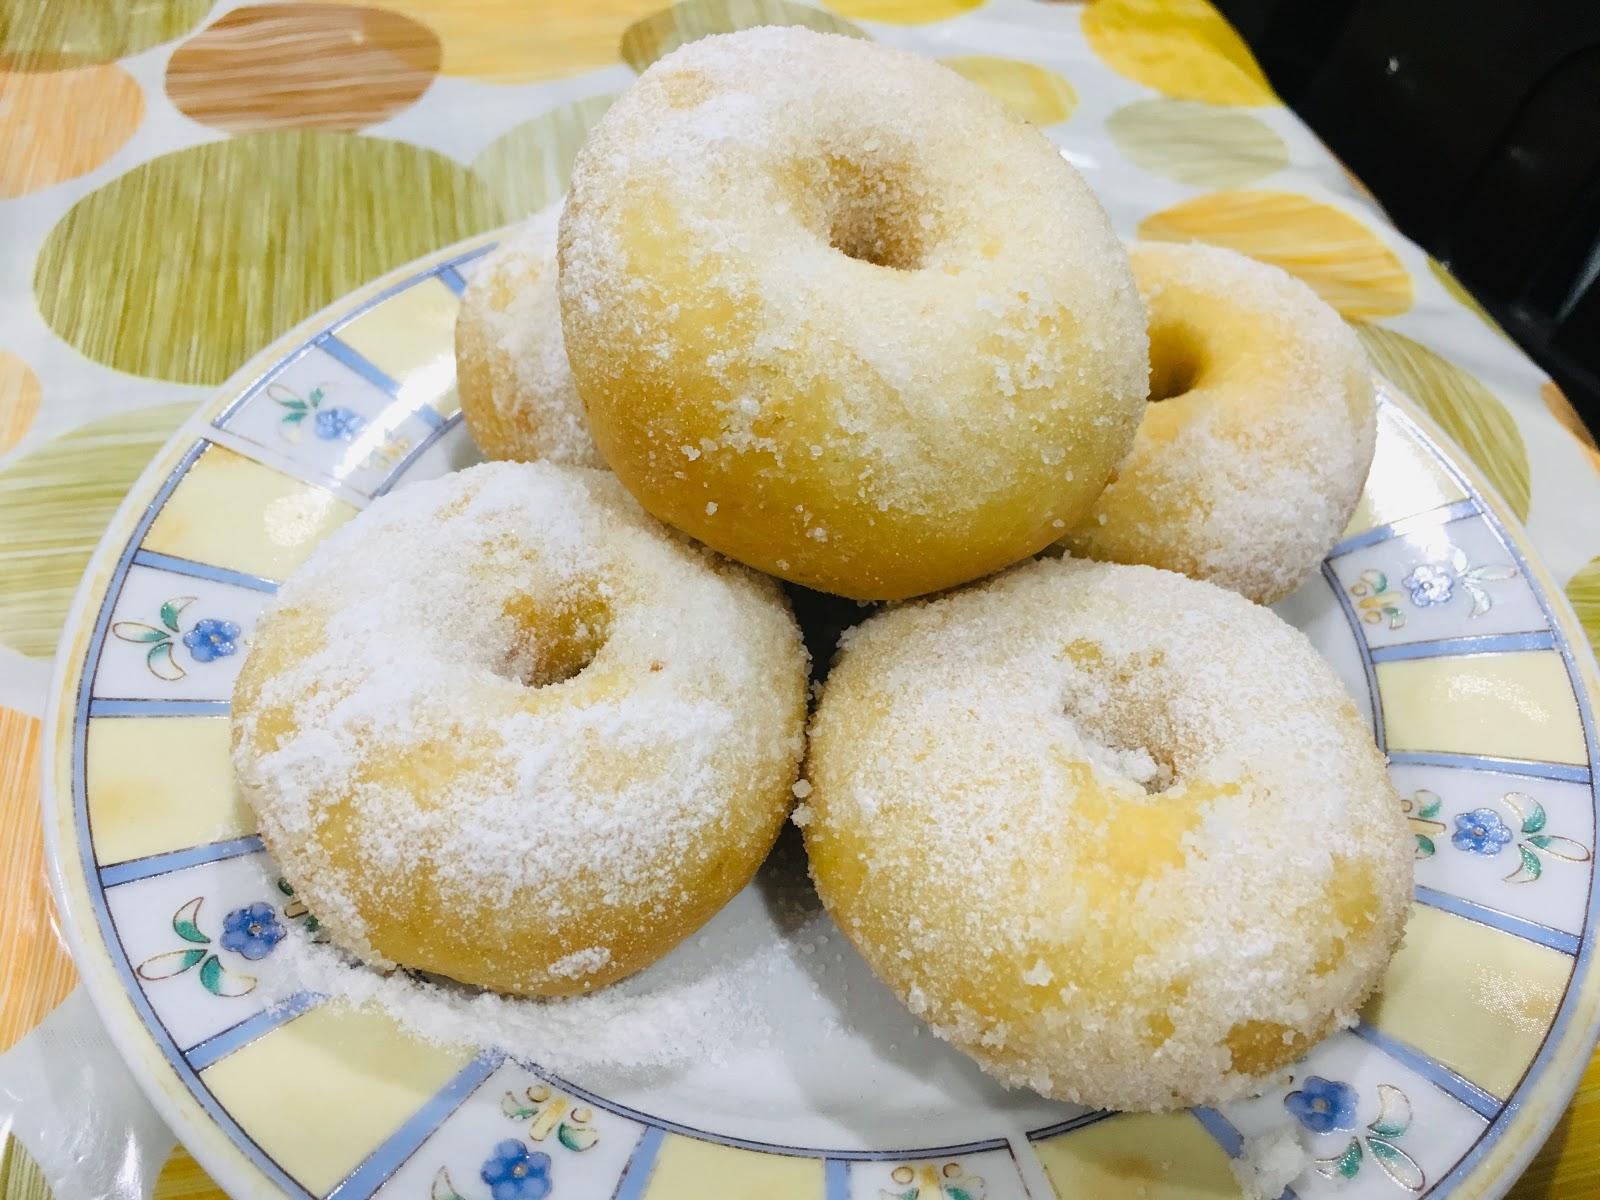 Resepi Donut Kentang Yang Mudah, Sedap, Lembut Dan Menjadi ...